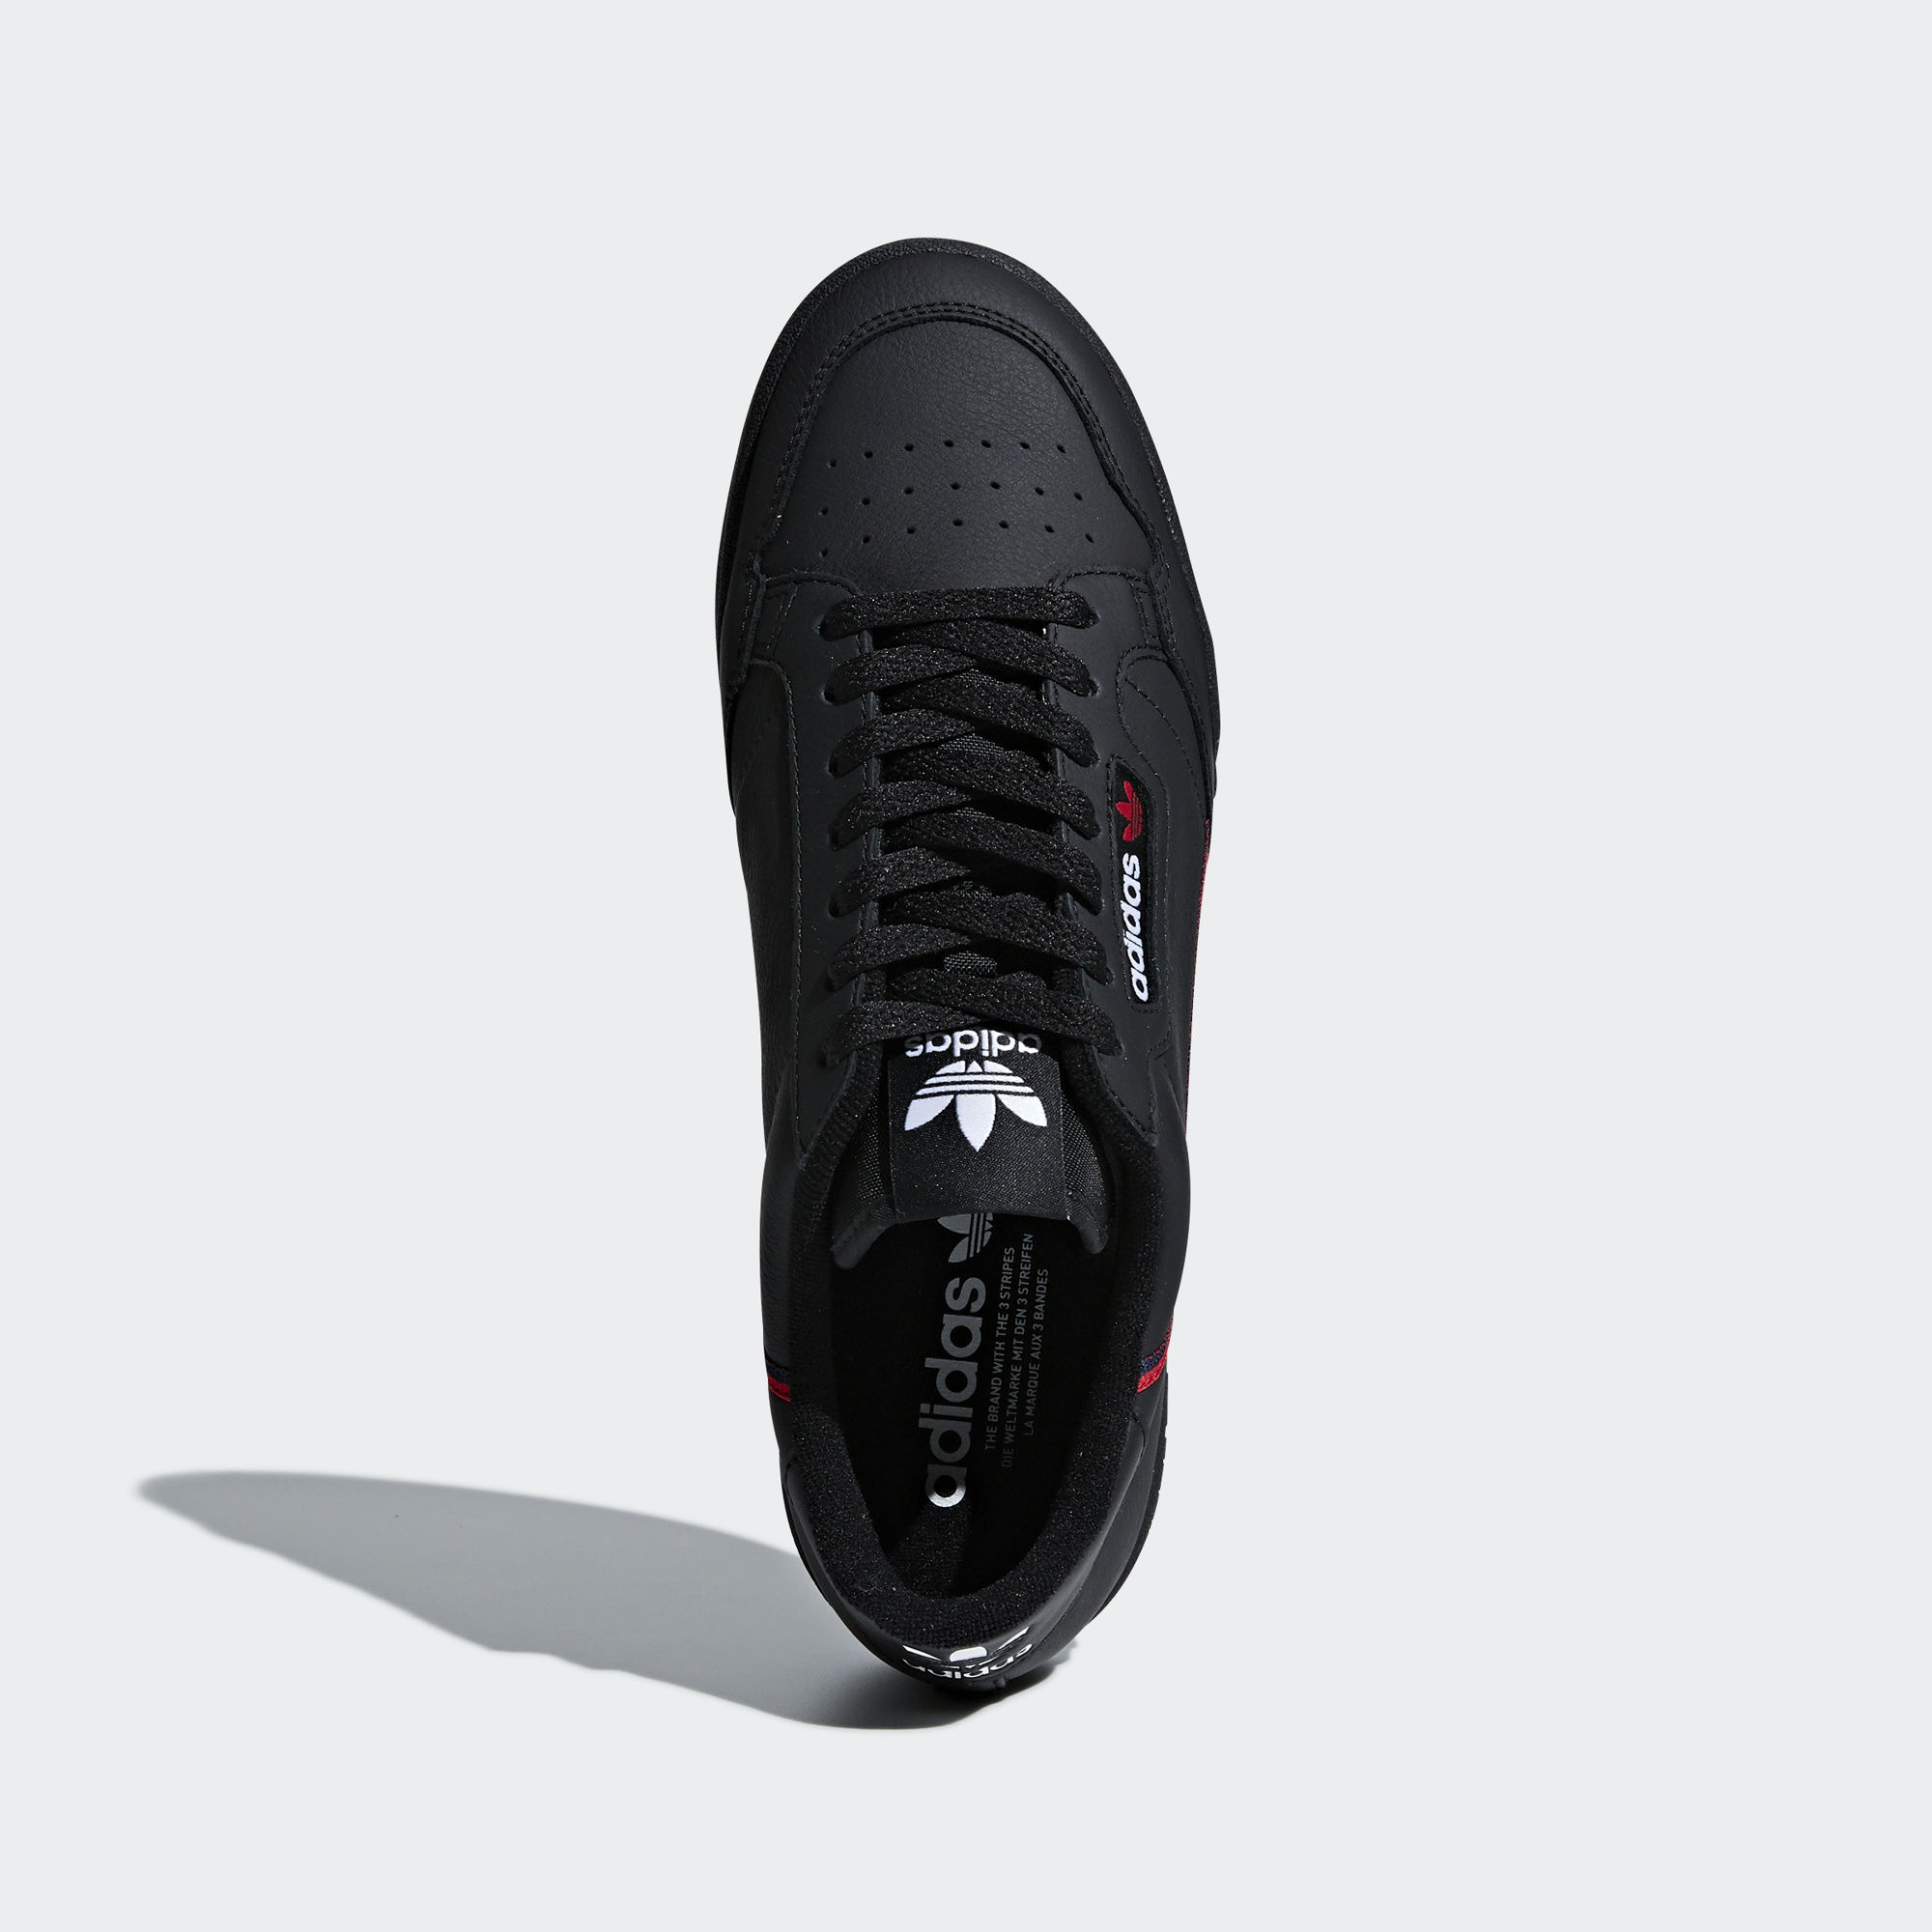 Adidas Continental 80 Rascal Core Black / Scarlet / Collegiate Navy (B41672)